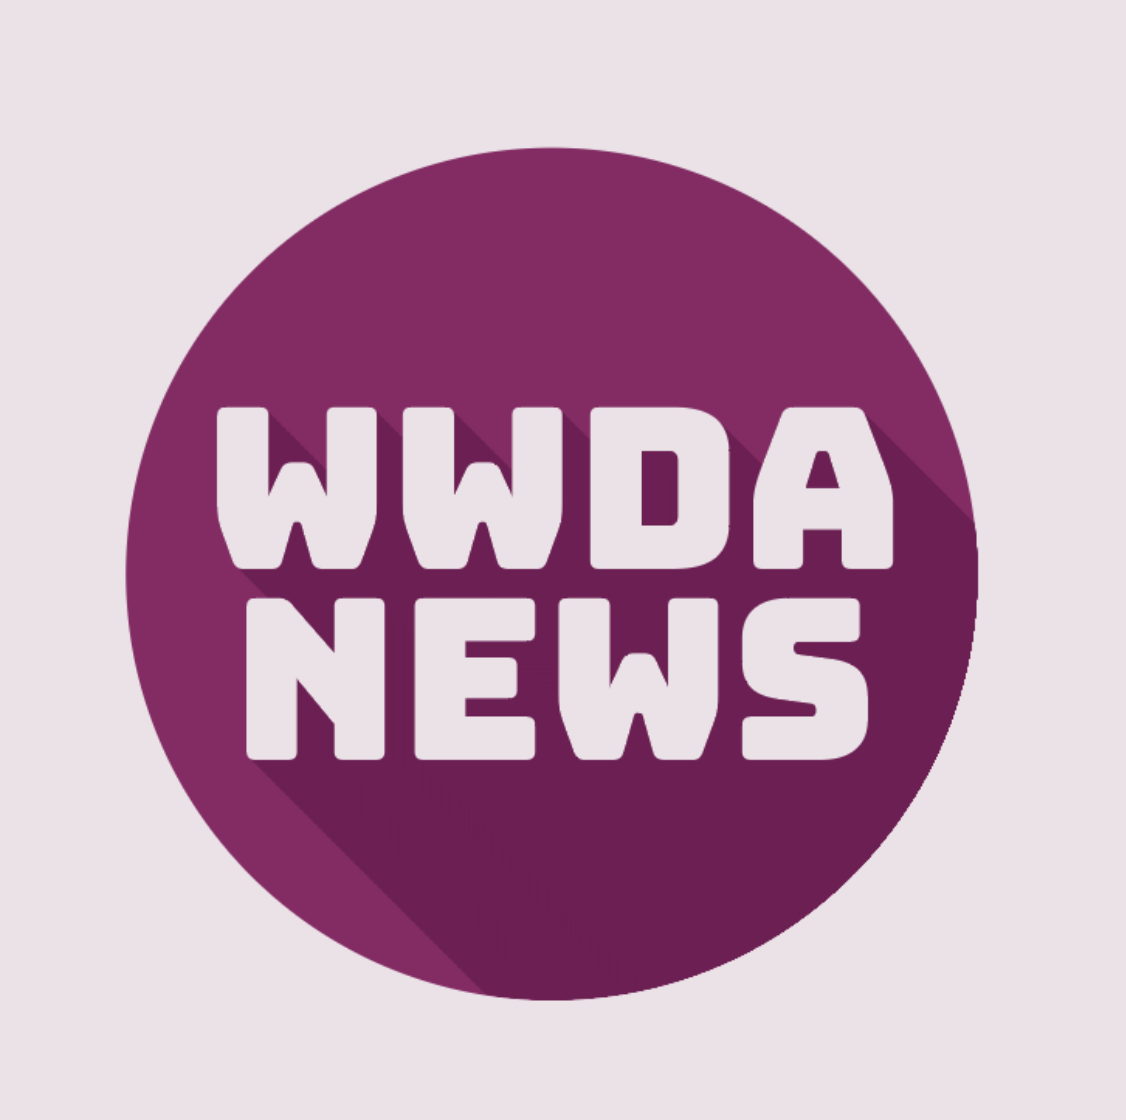 Purple cirlce with pink text: 'WWDA News.'